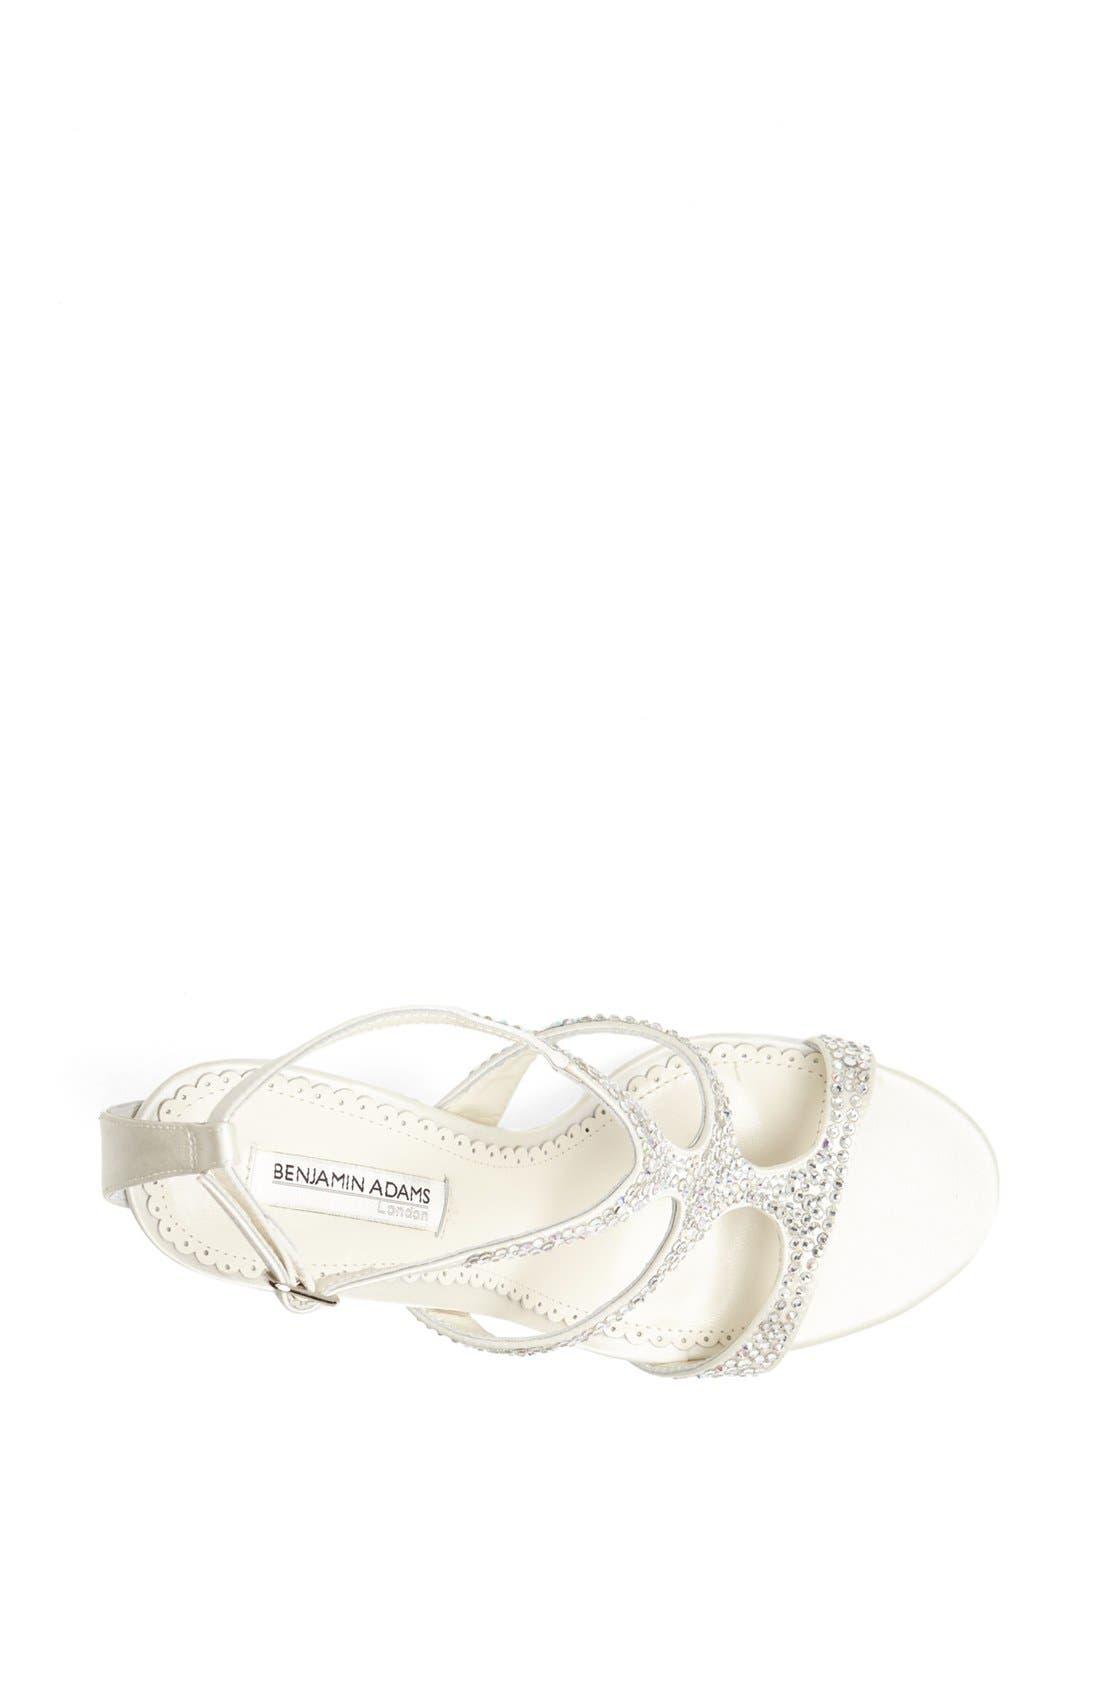 Alternate Image 3  - Benjamin Adams London 'Fox' Crystal Embellished Sandal